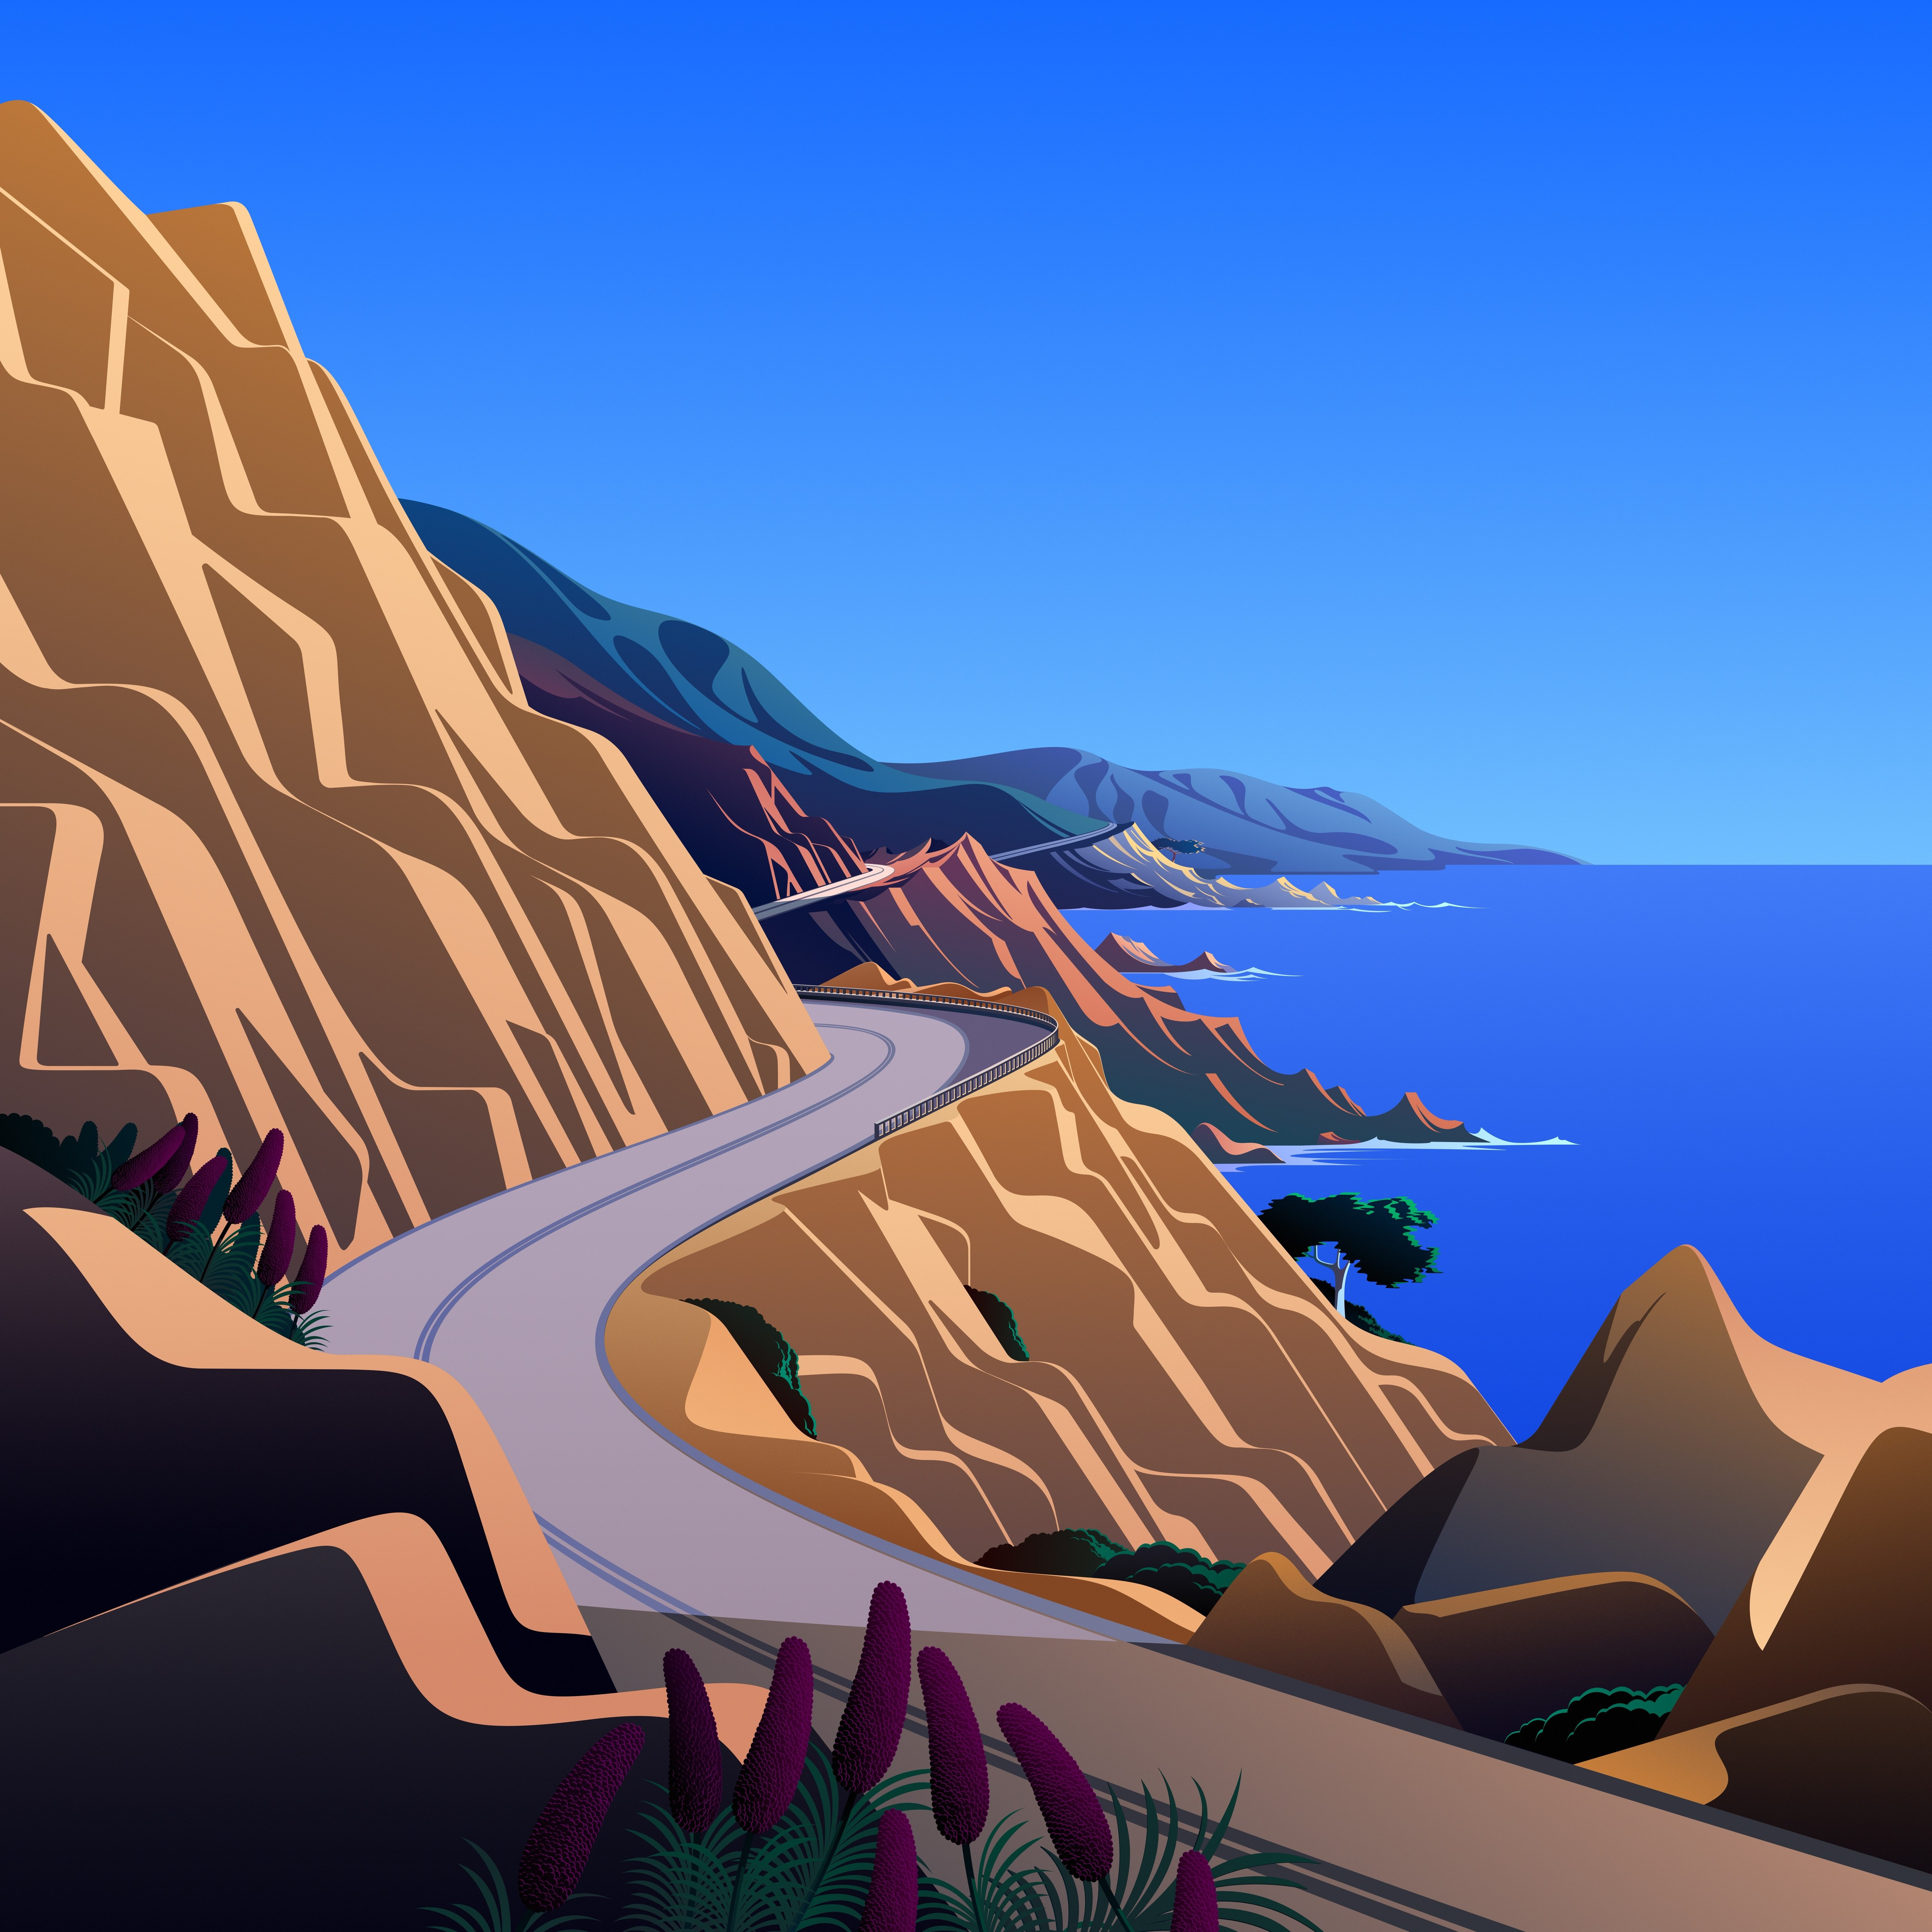 macOS Big Sur The Cliffs 5 dragged